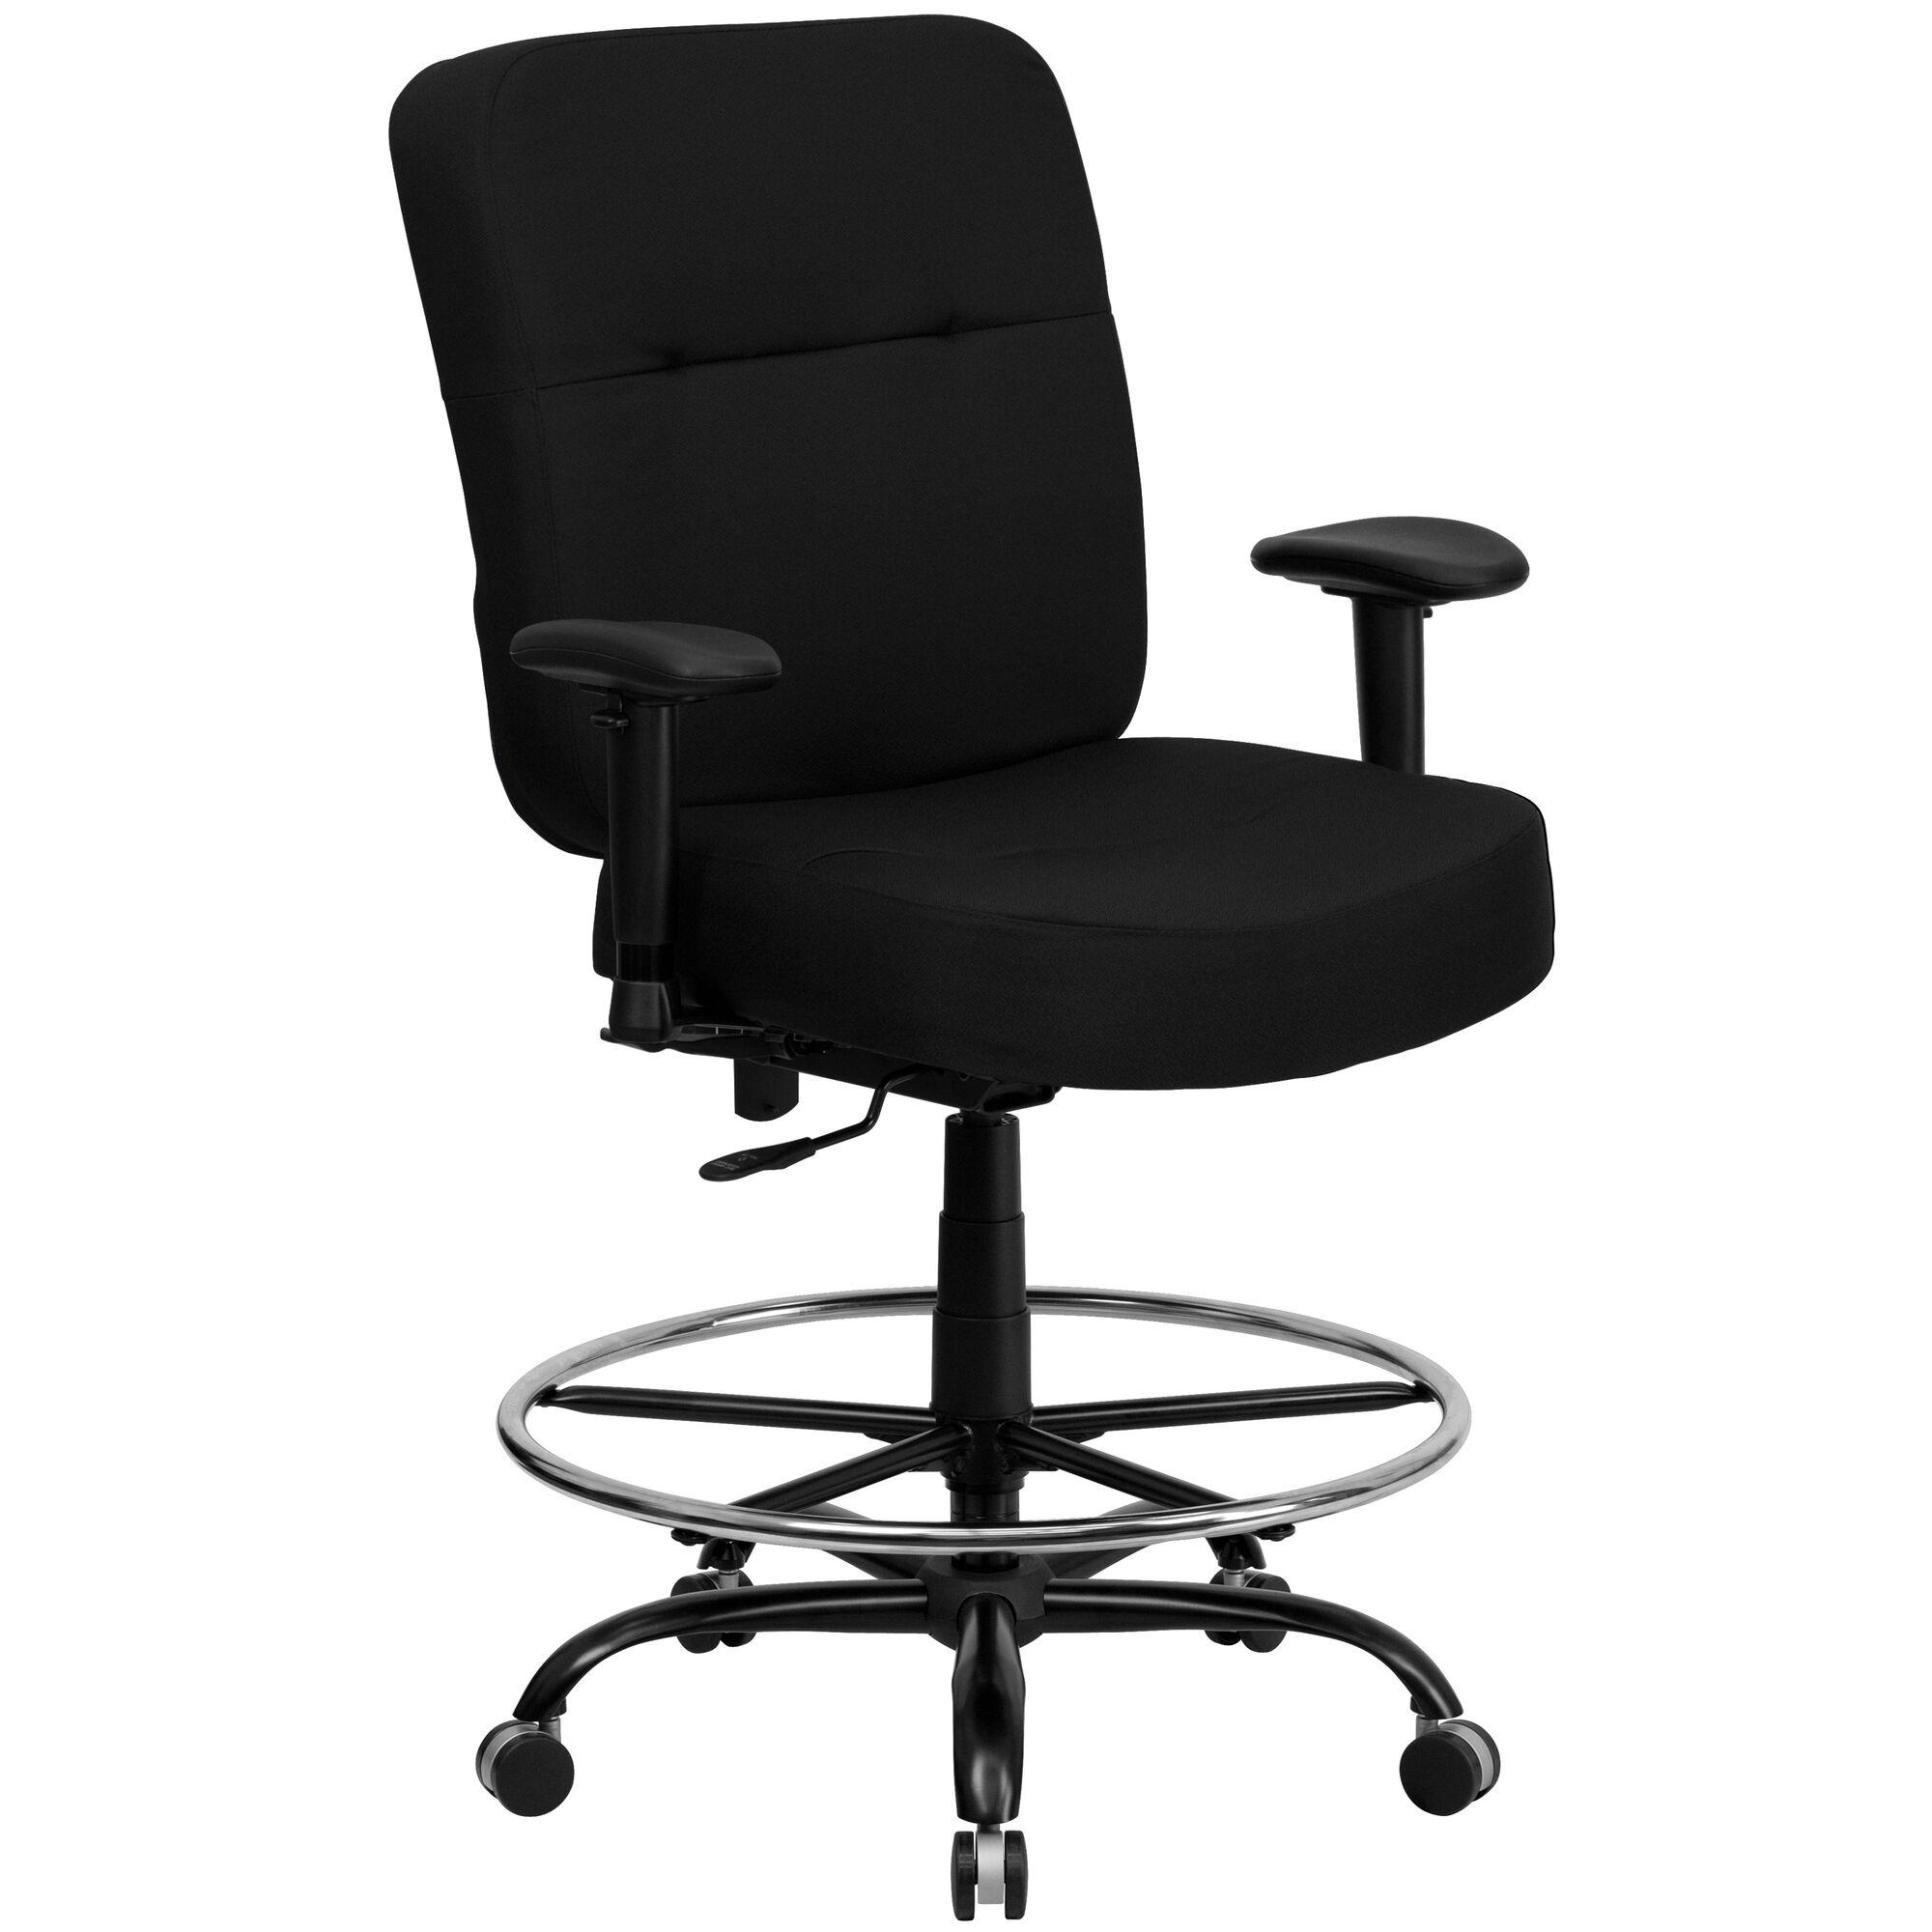 Hercules Series Big Tall 400 Lb Rated Black Fabric Rectangular Back Ergonomic Draft Chair With Adjustable Arms